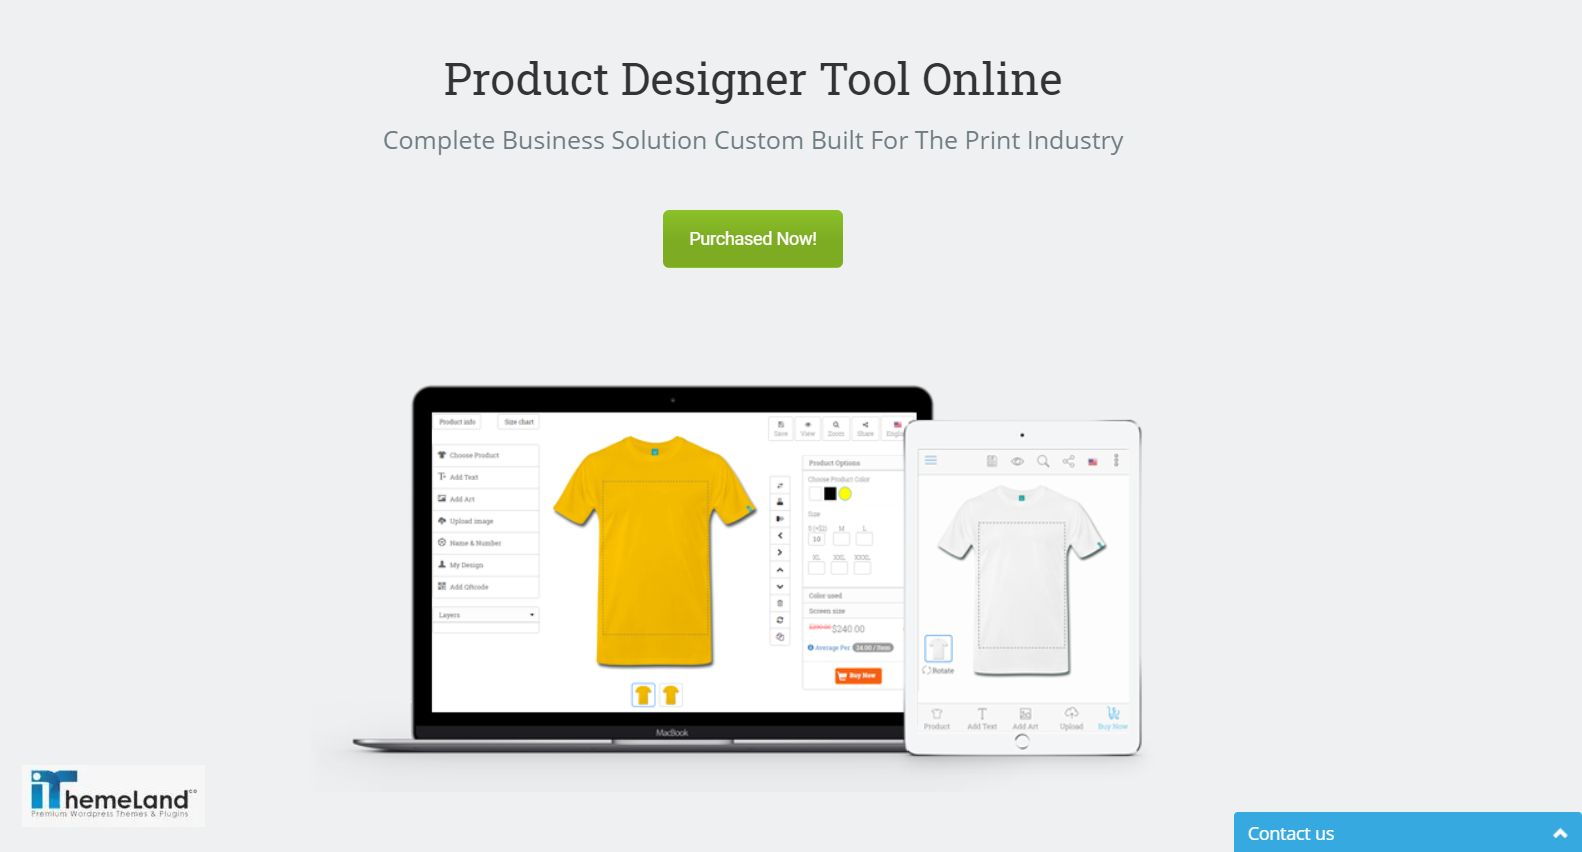 product designer tool online